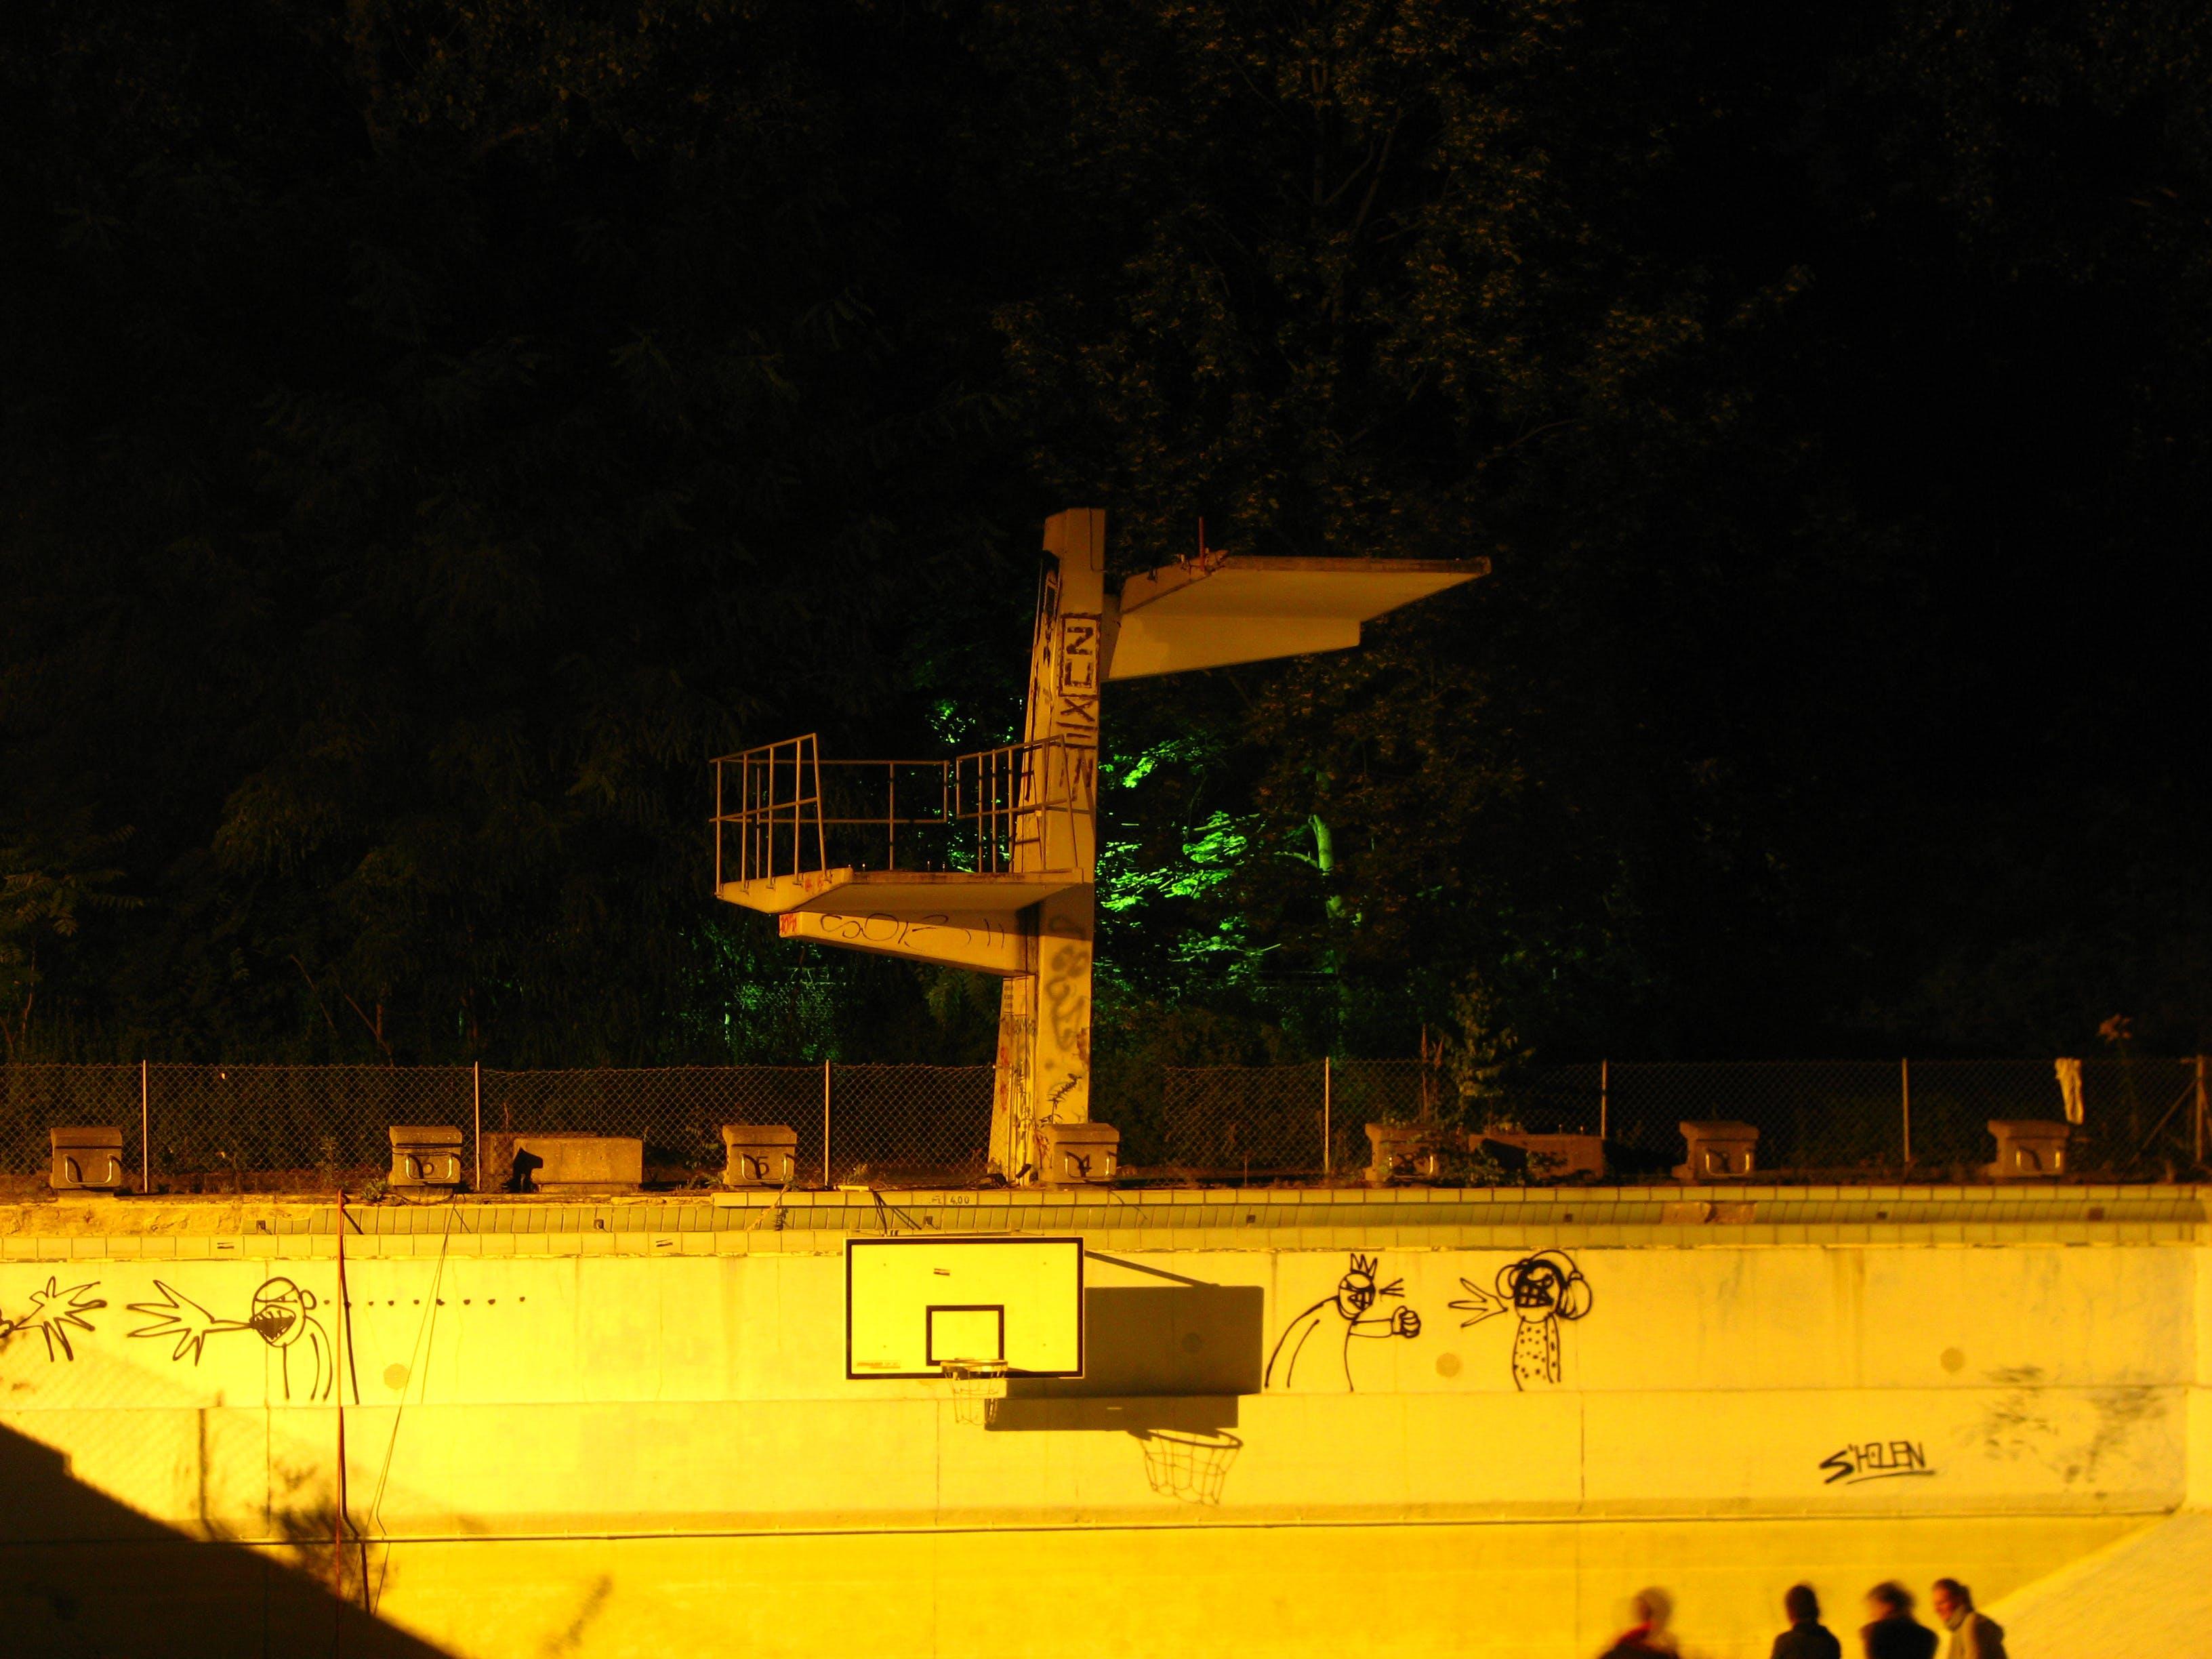 graffiti, pool, retro